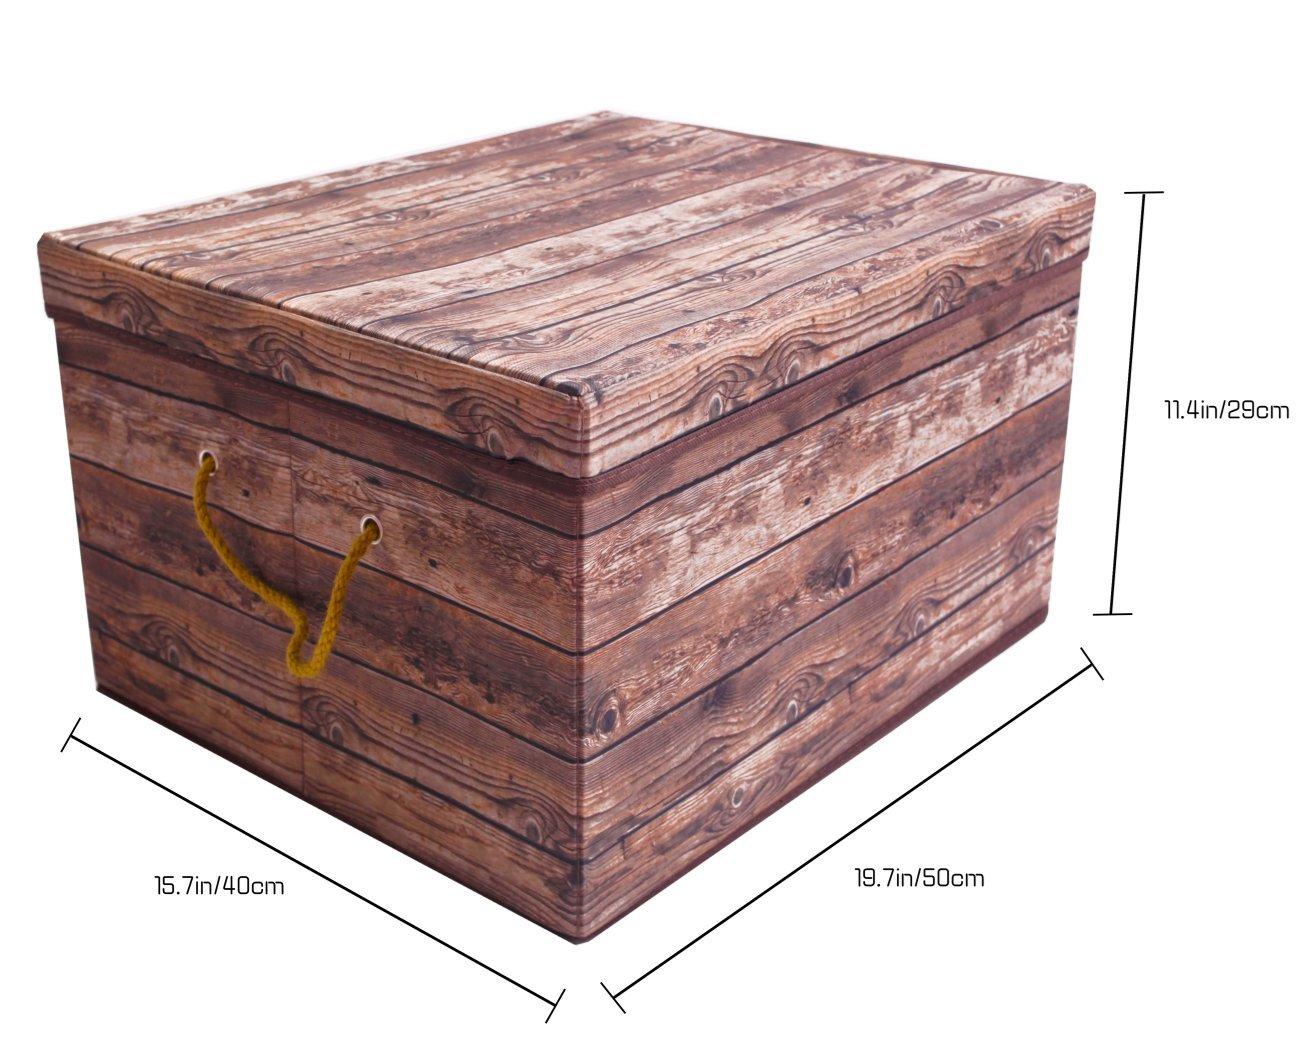 Nipole Vintage Imitation Wood Clothes Organizer Box Foldable Book Storage Basket Bins Large Size 19.7x15.7x11.4 082401